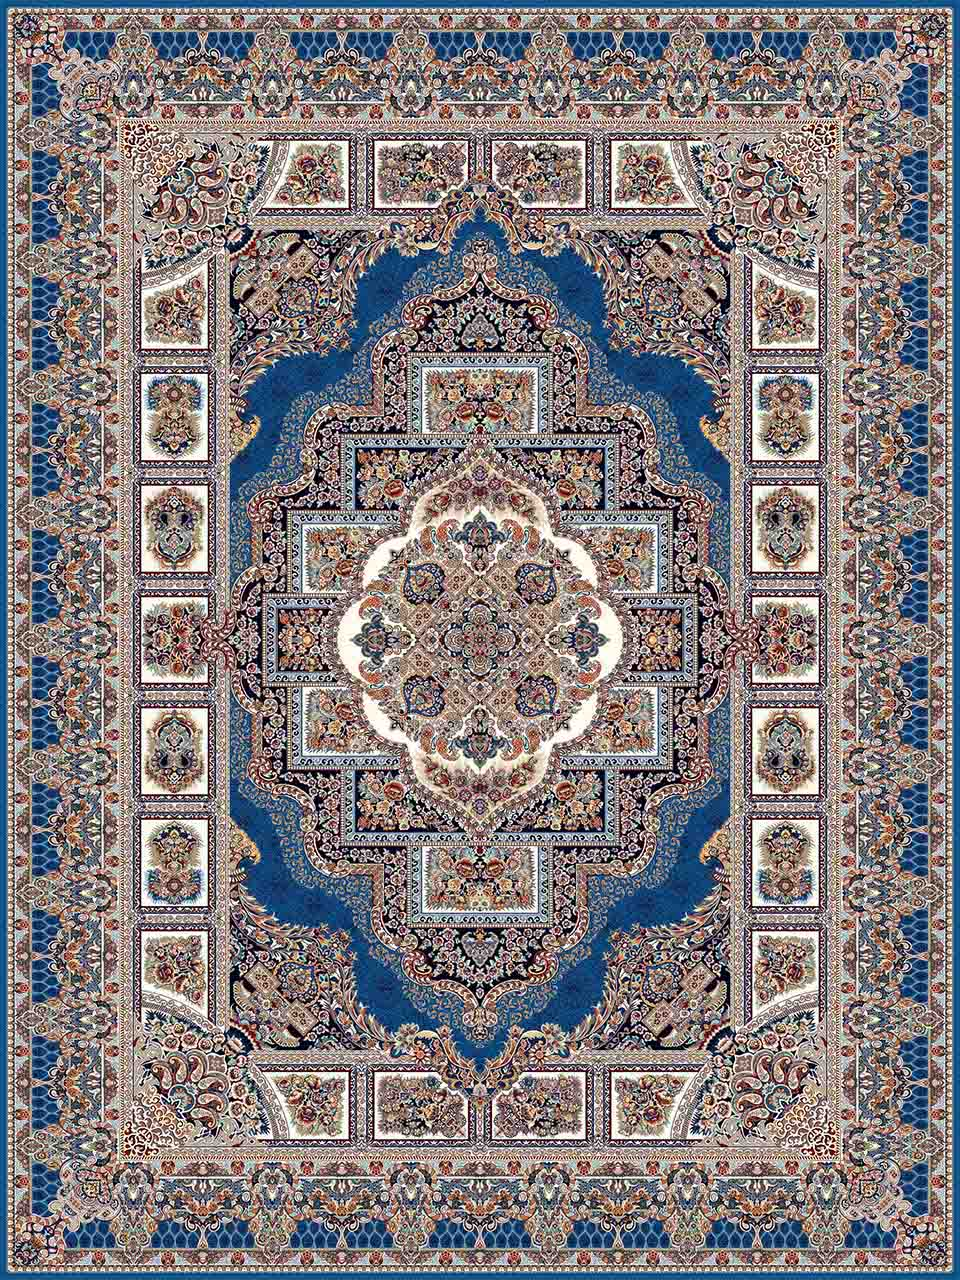 فرش (25032) اکریلیک - 8 رنگ - 700 شانه - آبي تيره - تراکم 2550